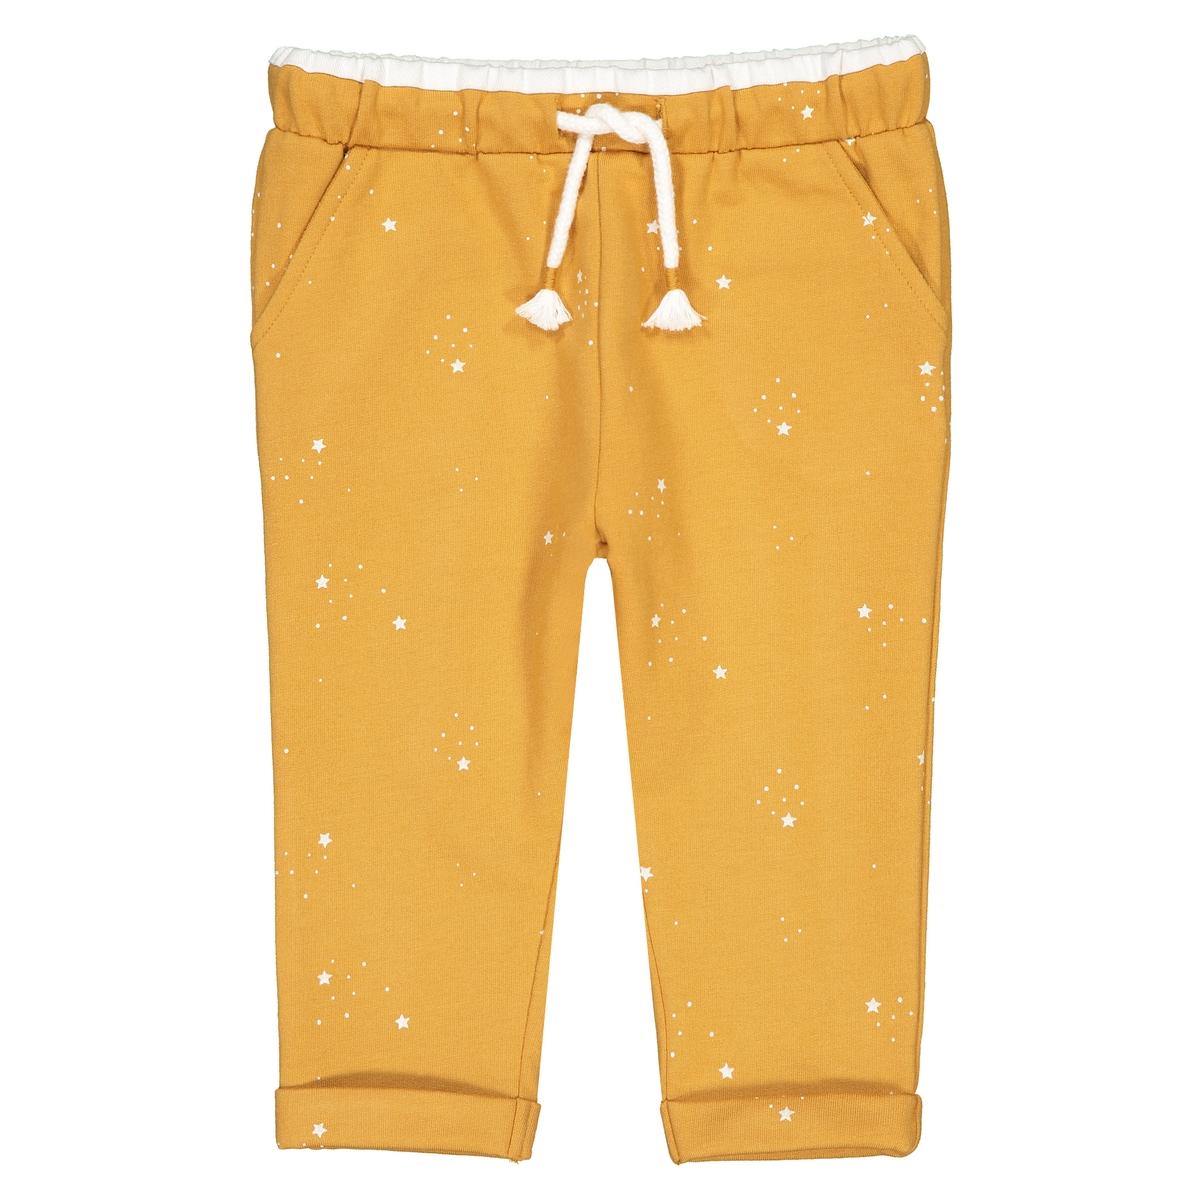 Брюки La Redoute Из мольтона с принтом звезды мес- года 18 мес. - 81 см желтый шорты la redoute из велюра мес года 18 мес 81 см розовый